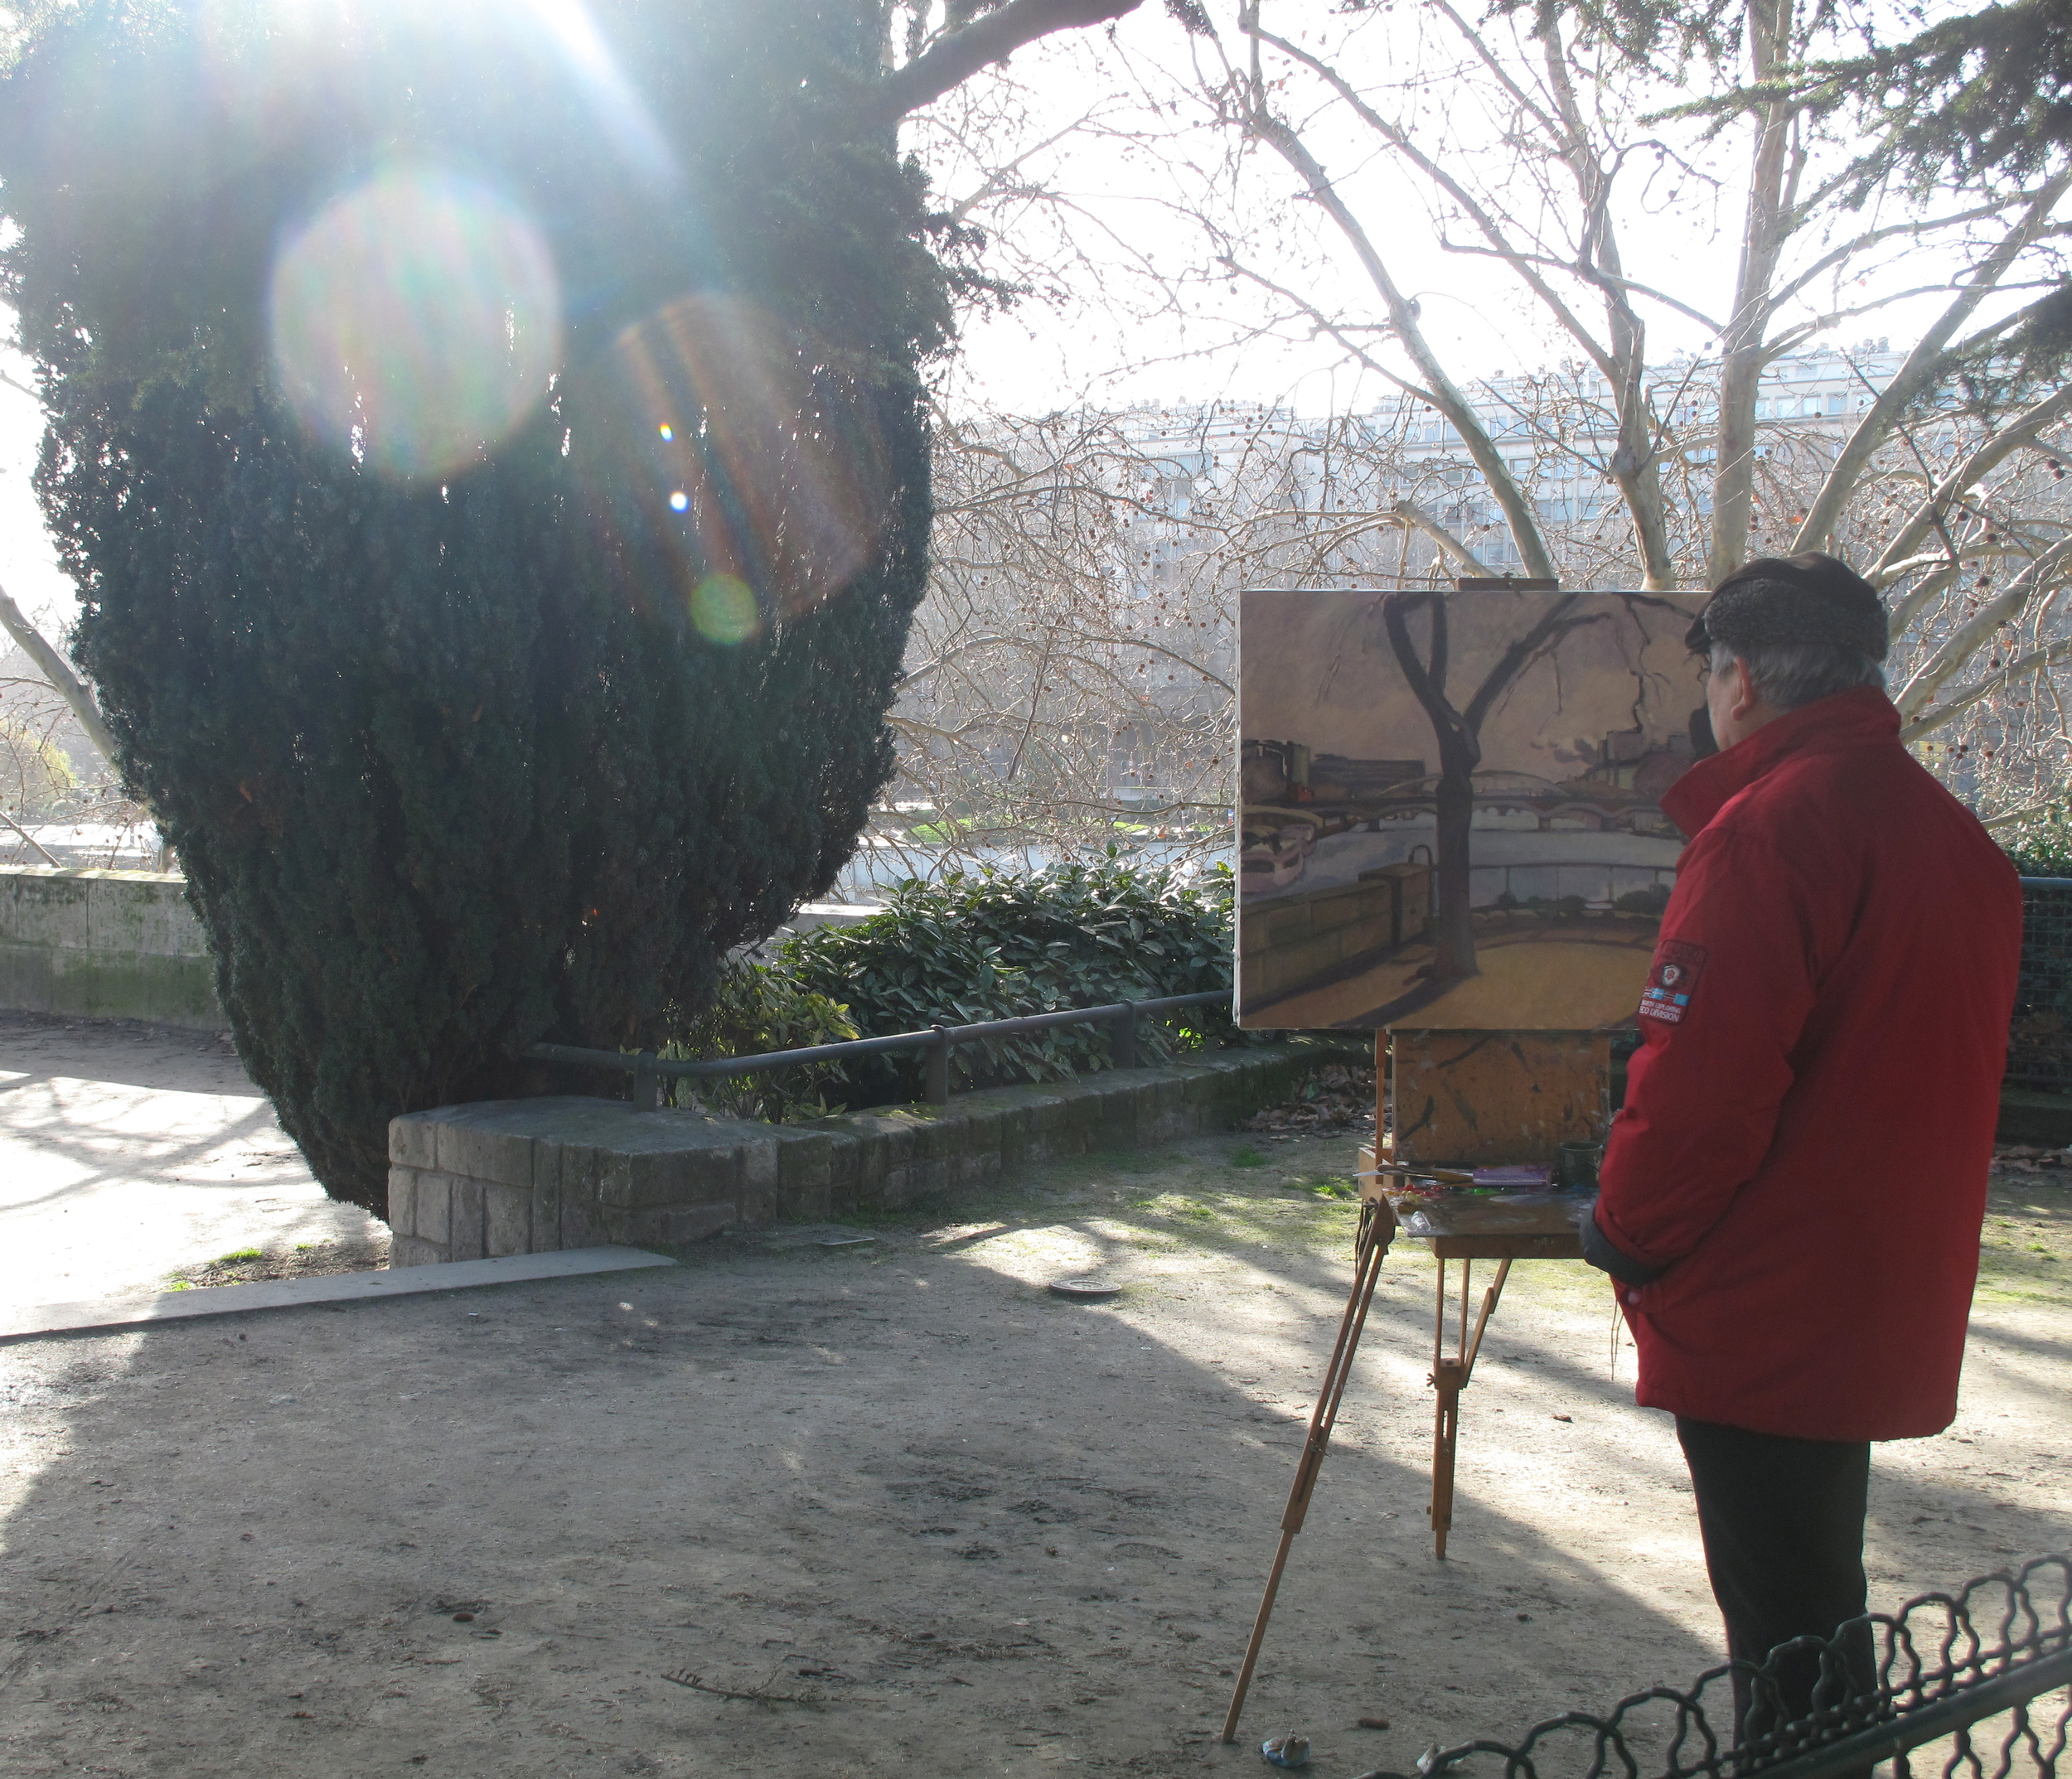 Painter in the Île Saint Louis in Paris, painting en plein air